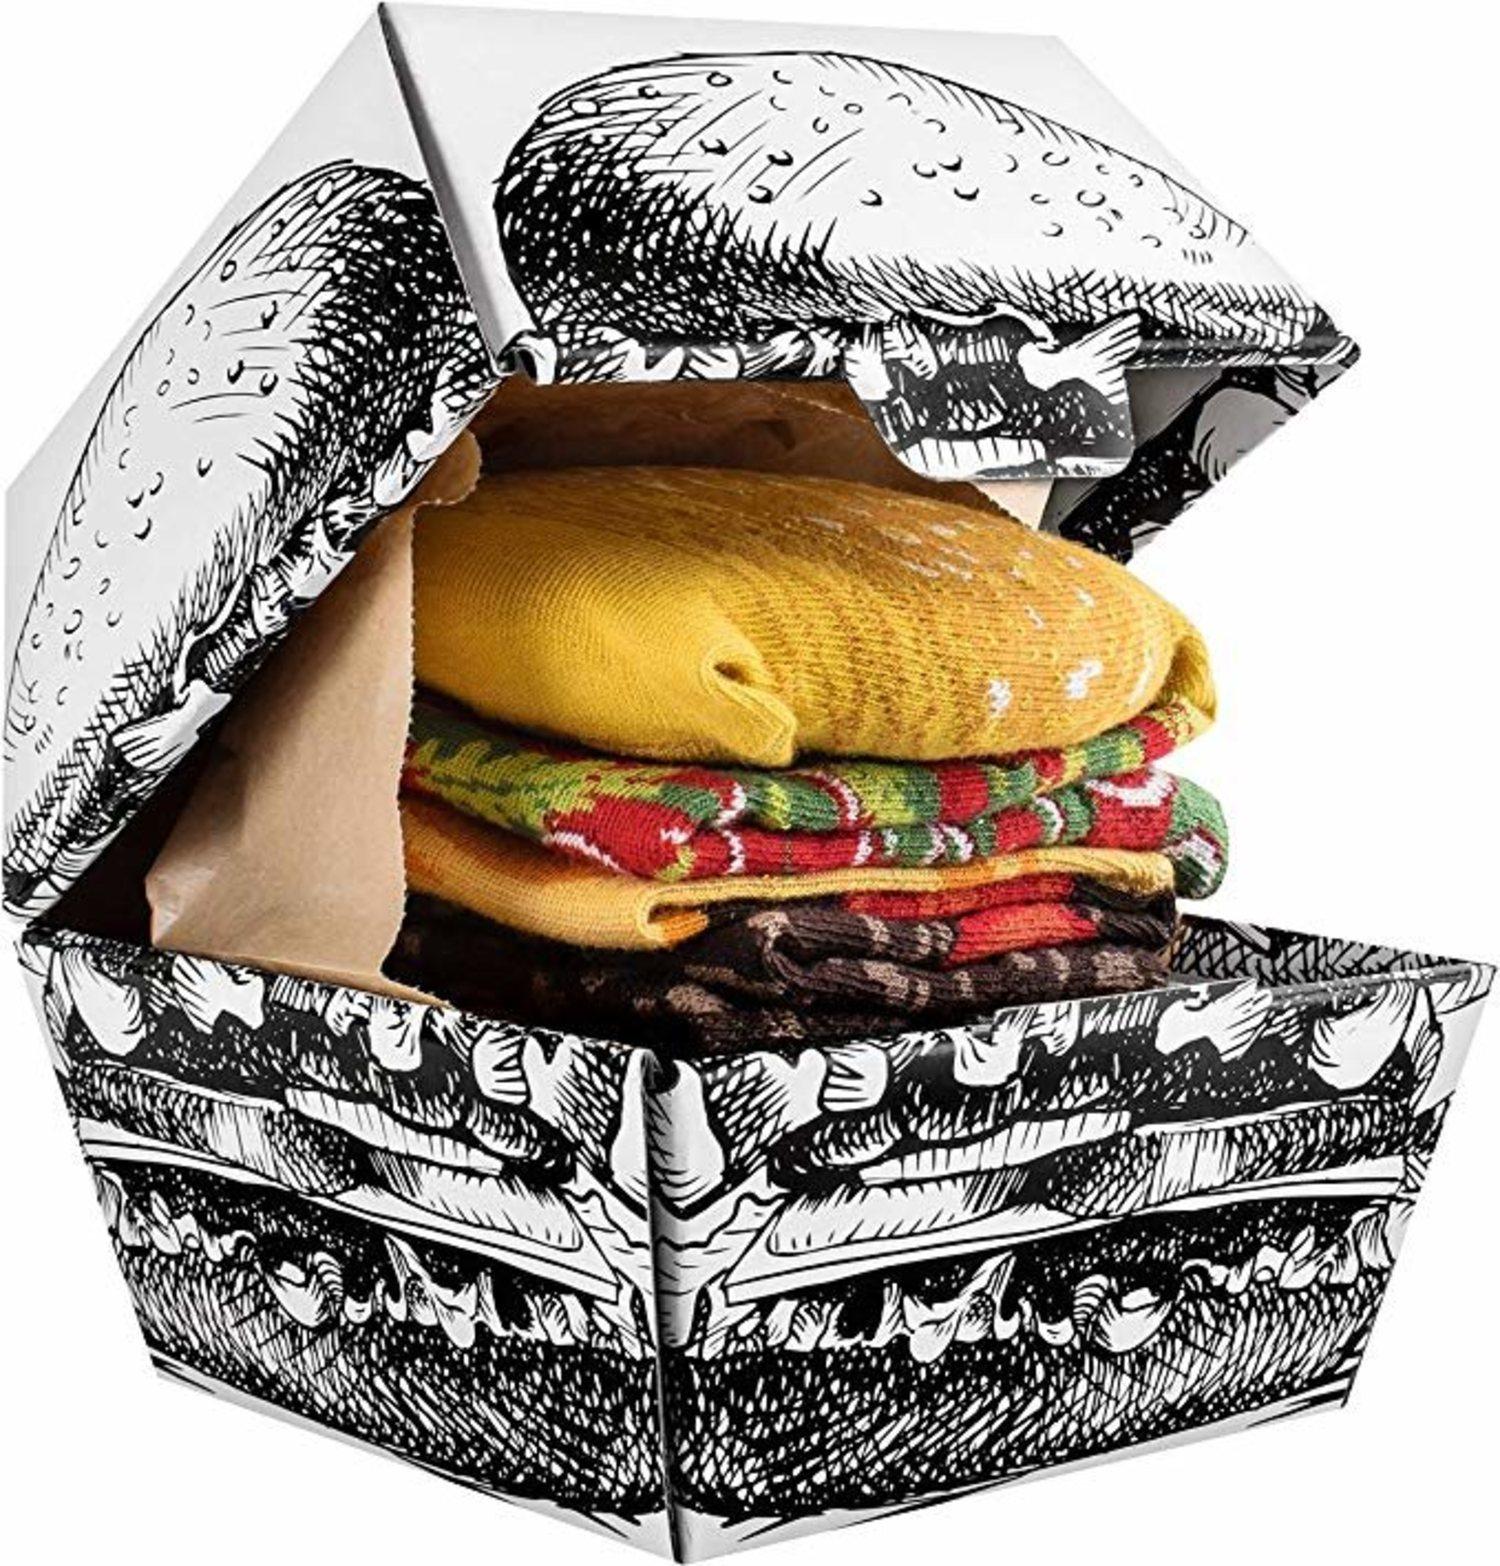 Calcetines hamburguesas.